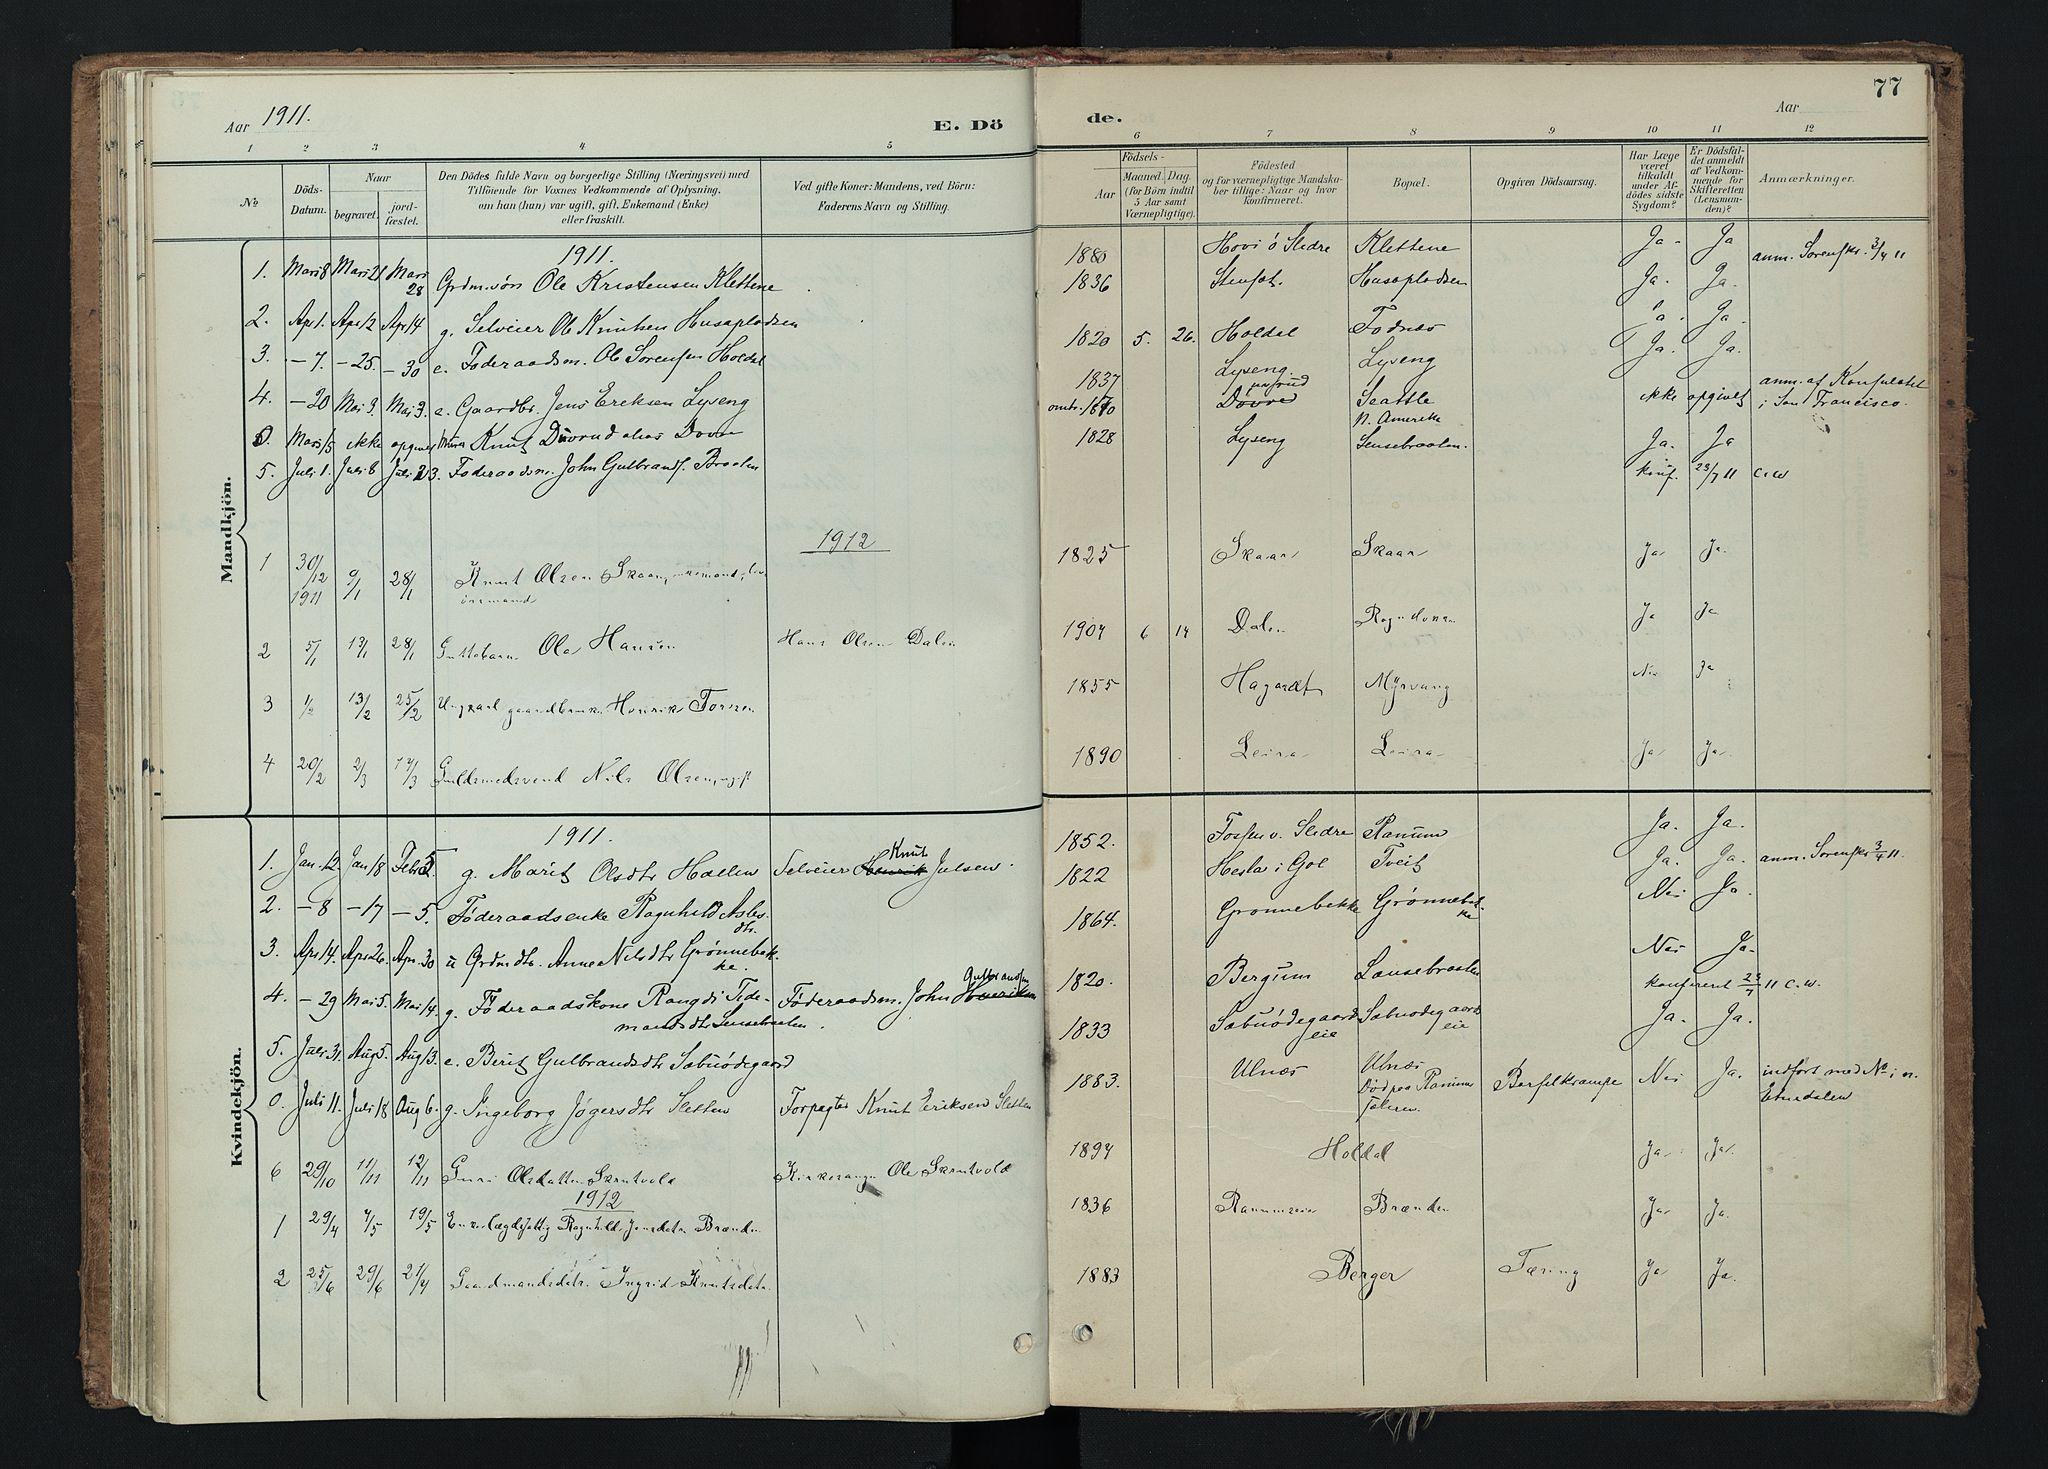 SAH, Nord-Aurdal prestekontor, Ministerialbok nr. 15, 1896-1914, s. 77